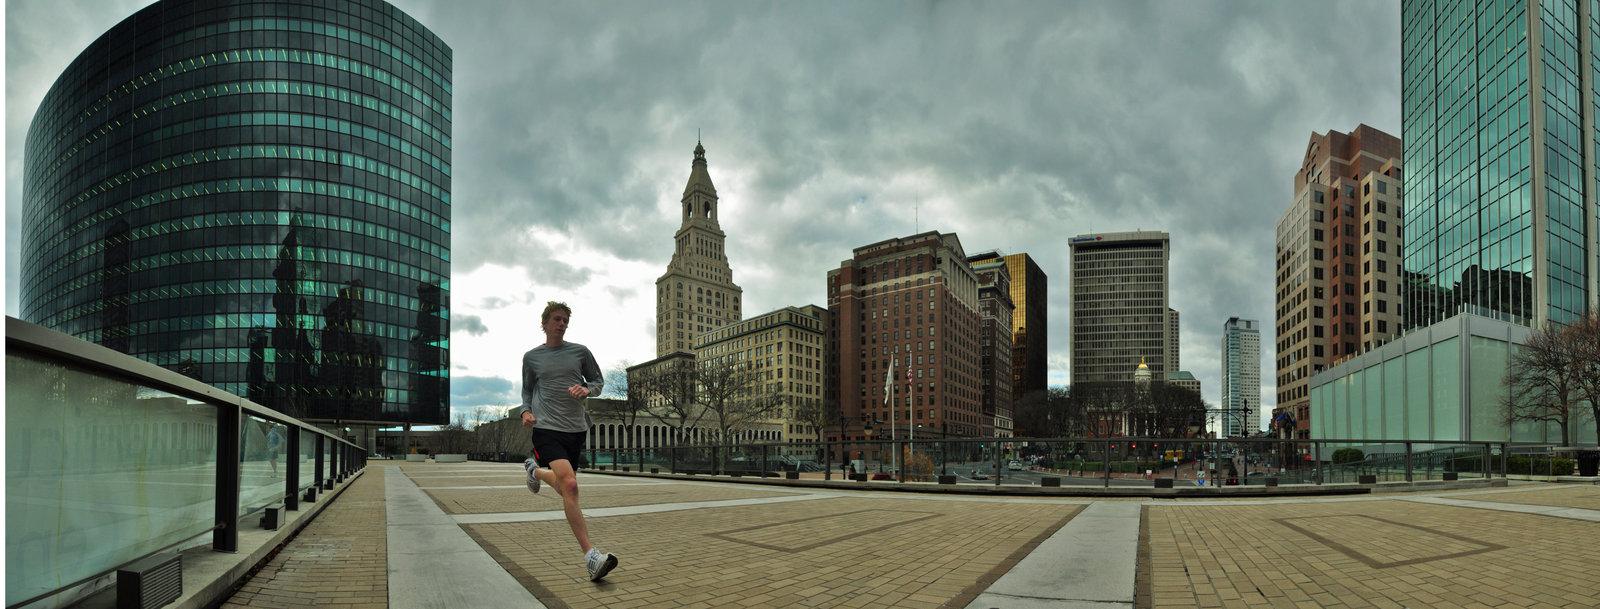 Rave Run Hartford by WorldFilmProject 1600x609